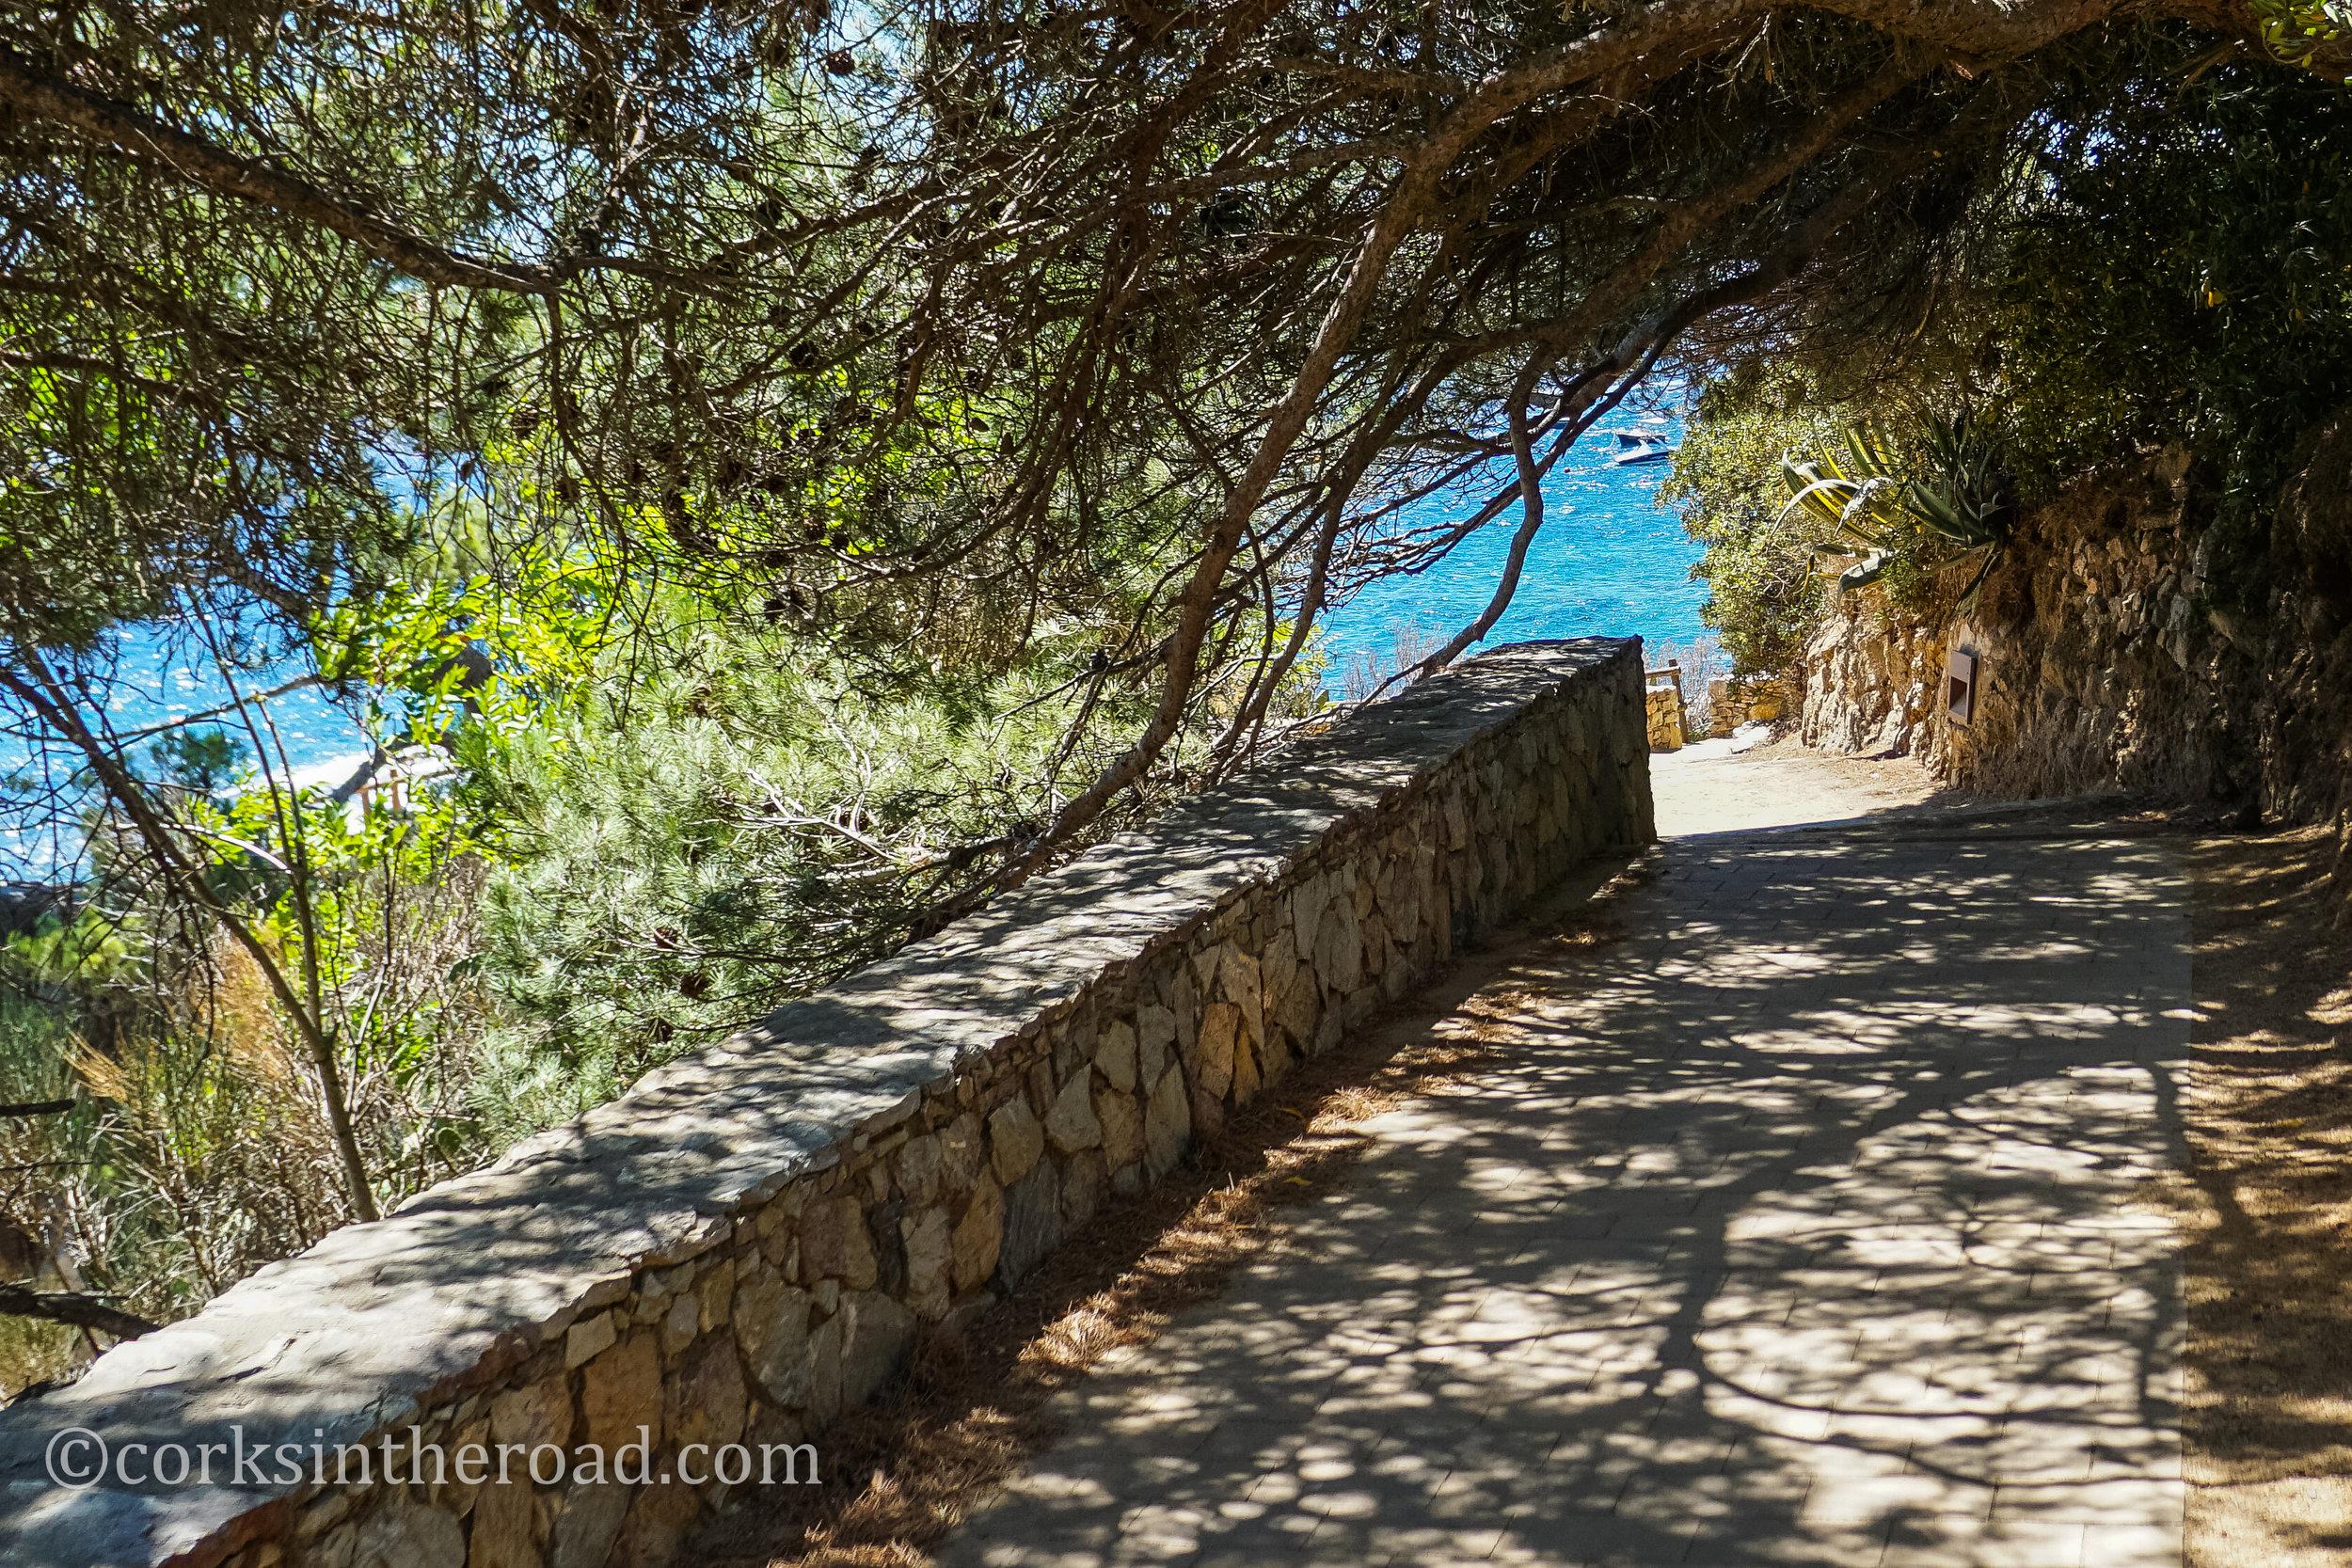 20160807Barcelona, Corksintheroad, Costa Brava, Costa Brava Landscape-17.jpg